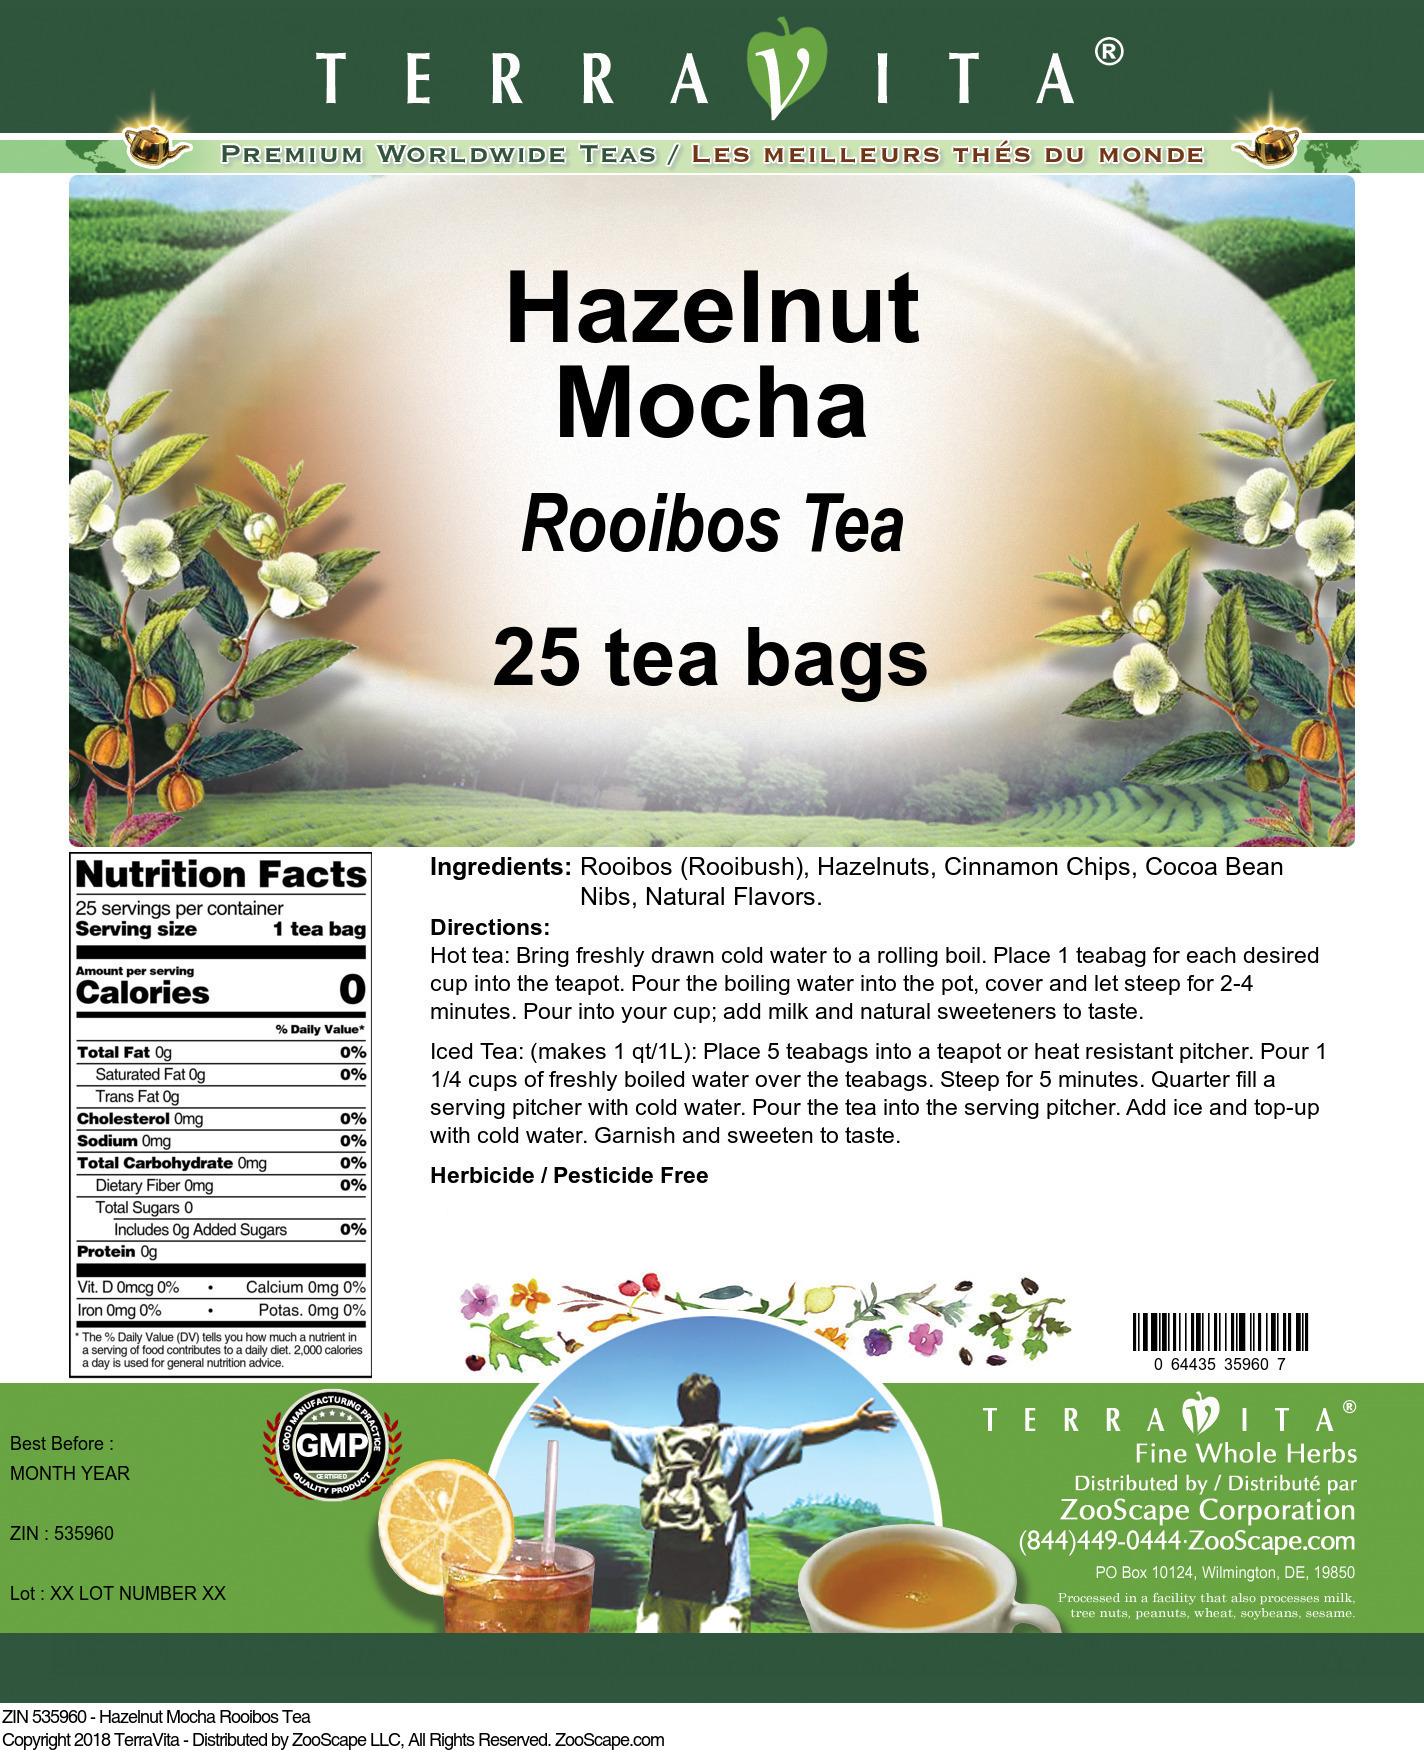 Hazelnut Mocha Rooibos Tea